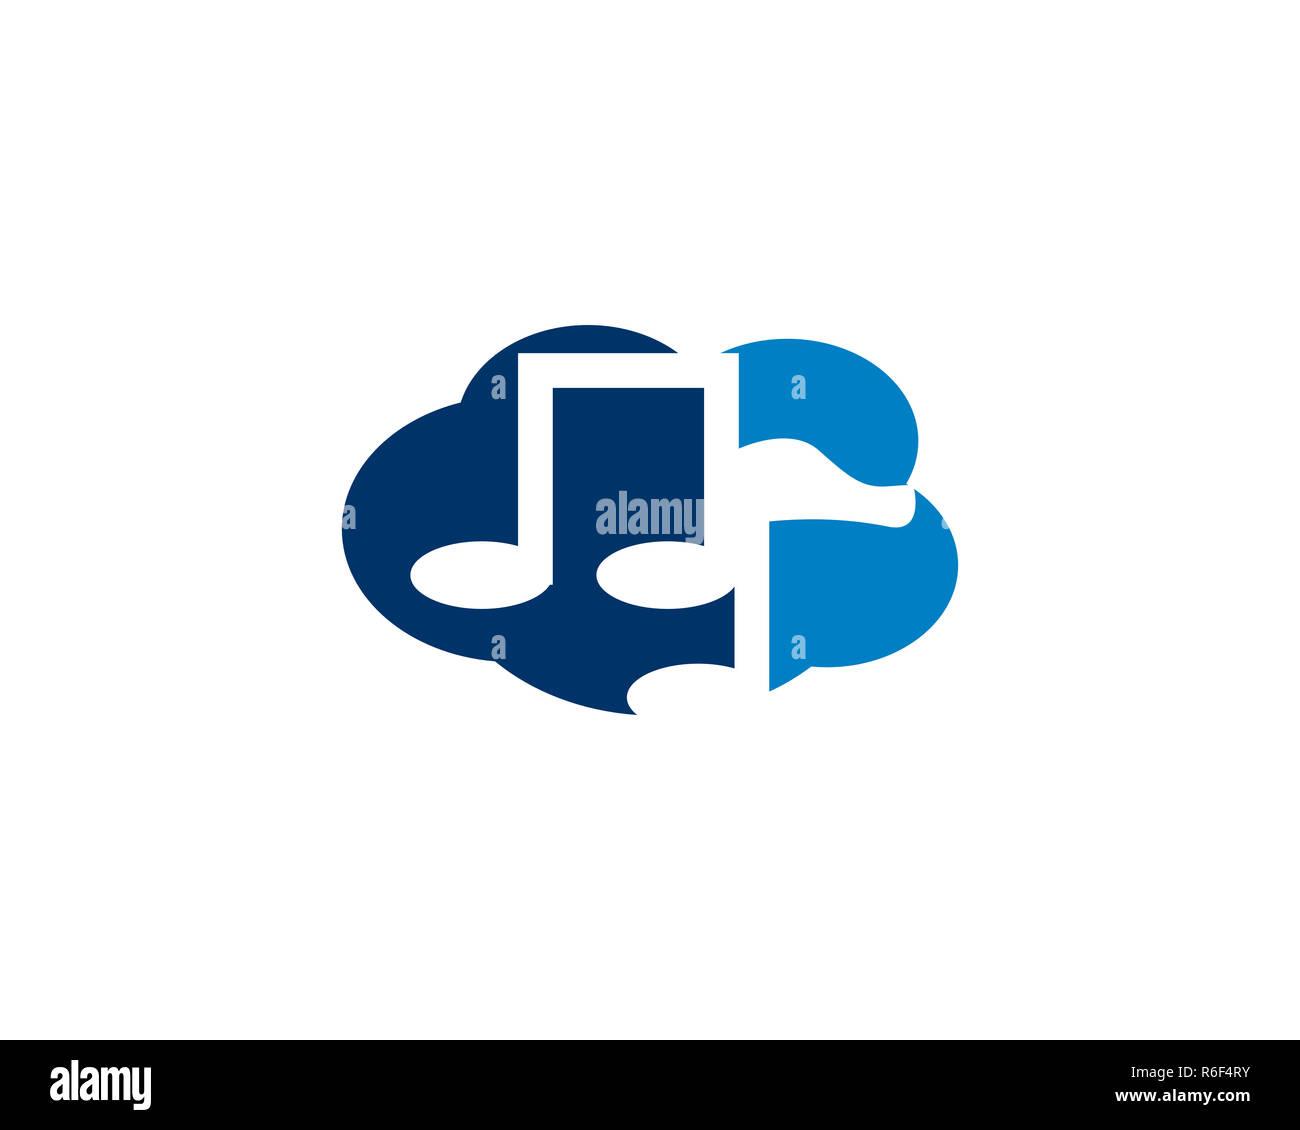 cloud music logo Stock Photo